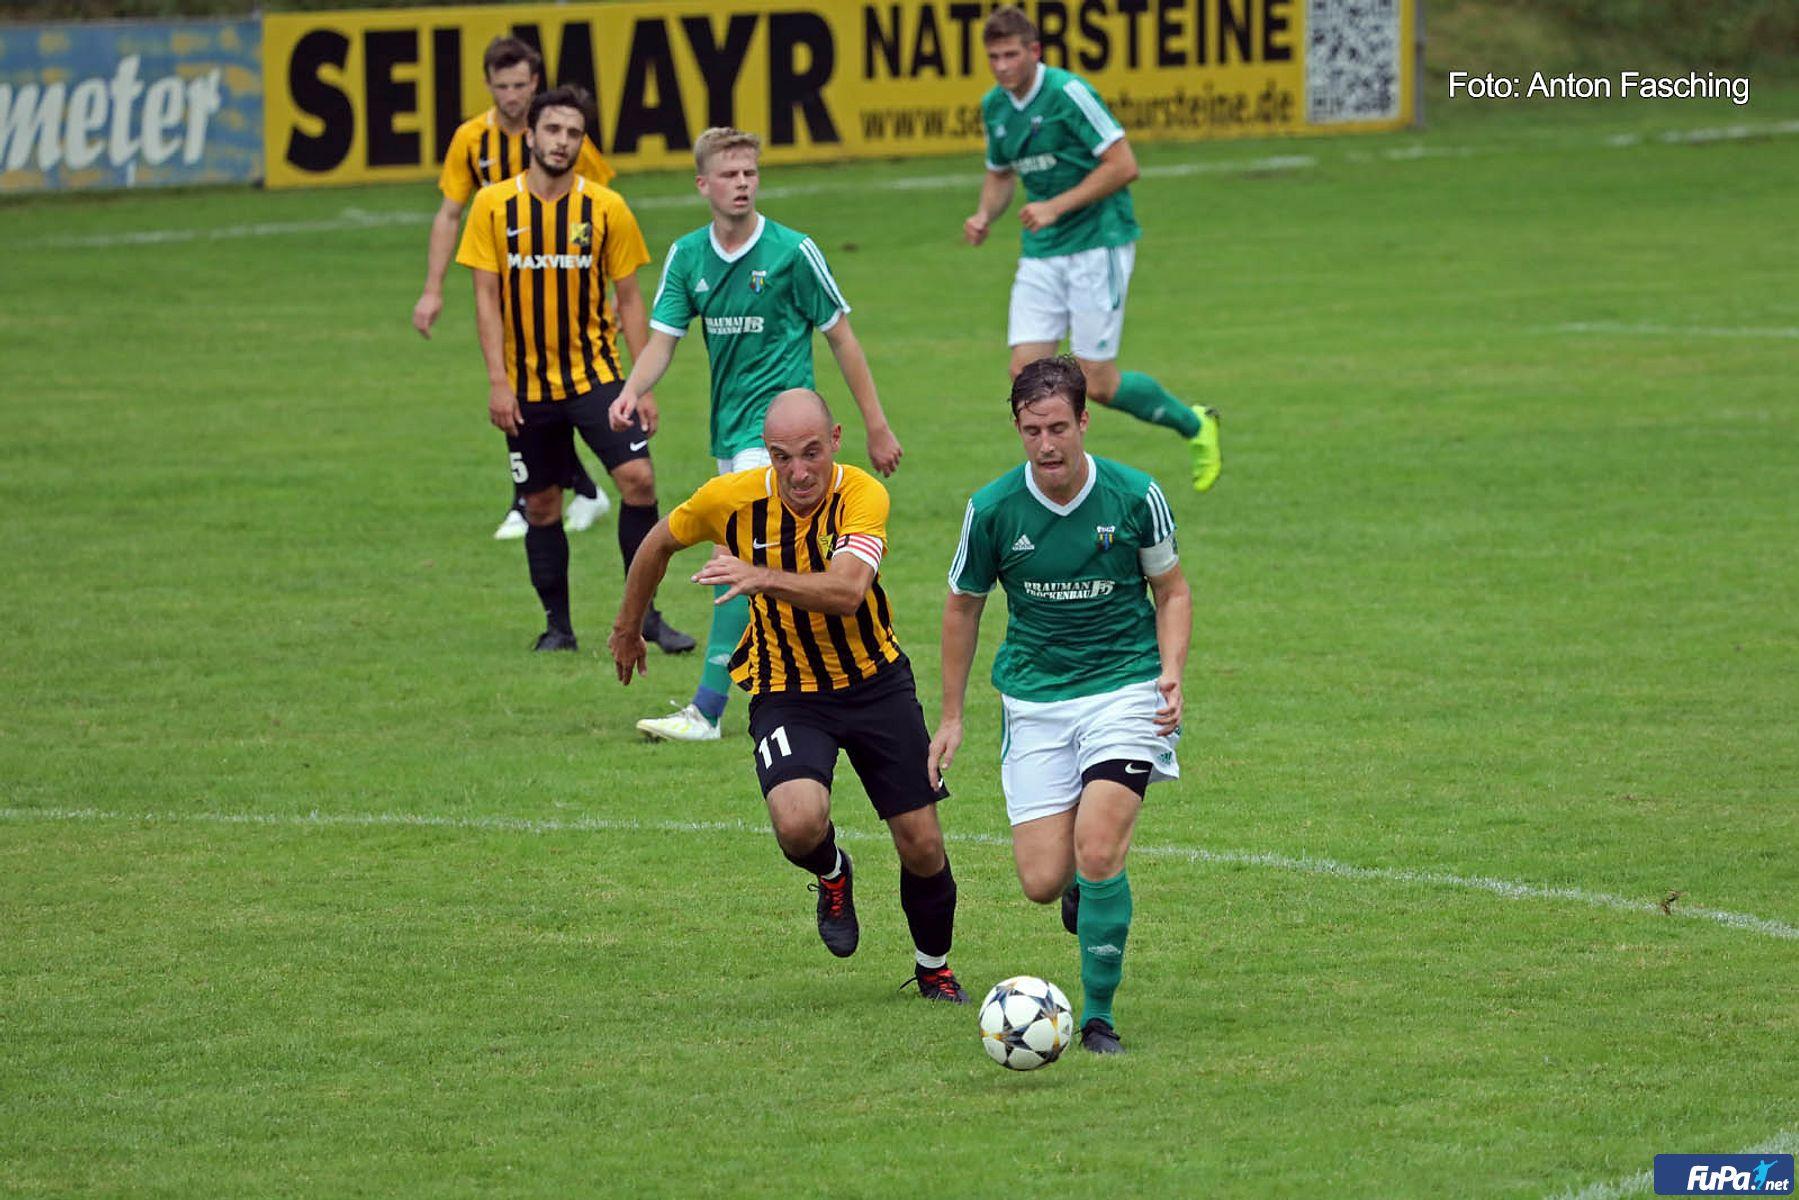 Josi Hartmann